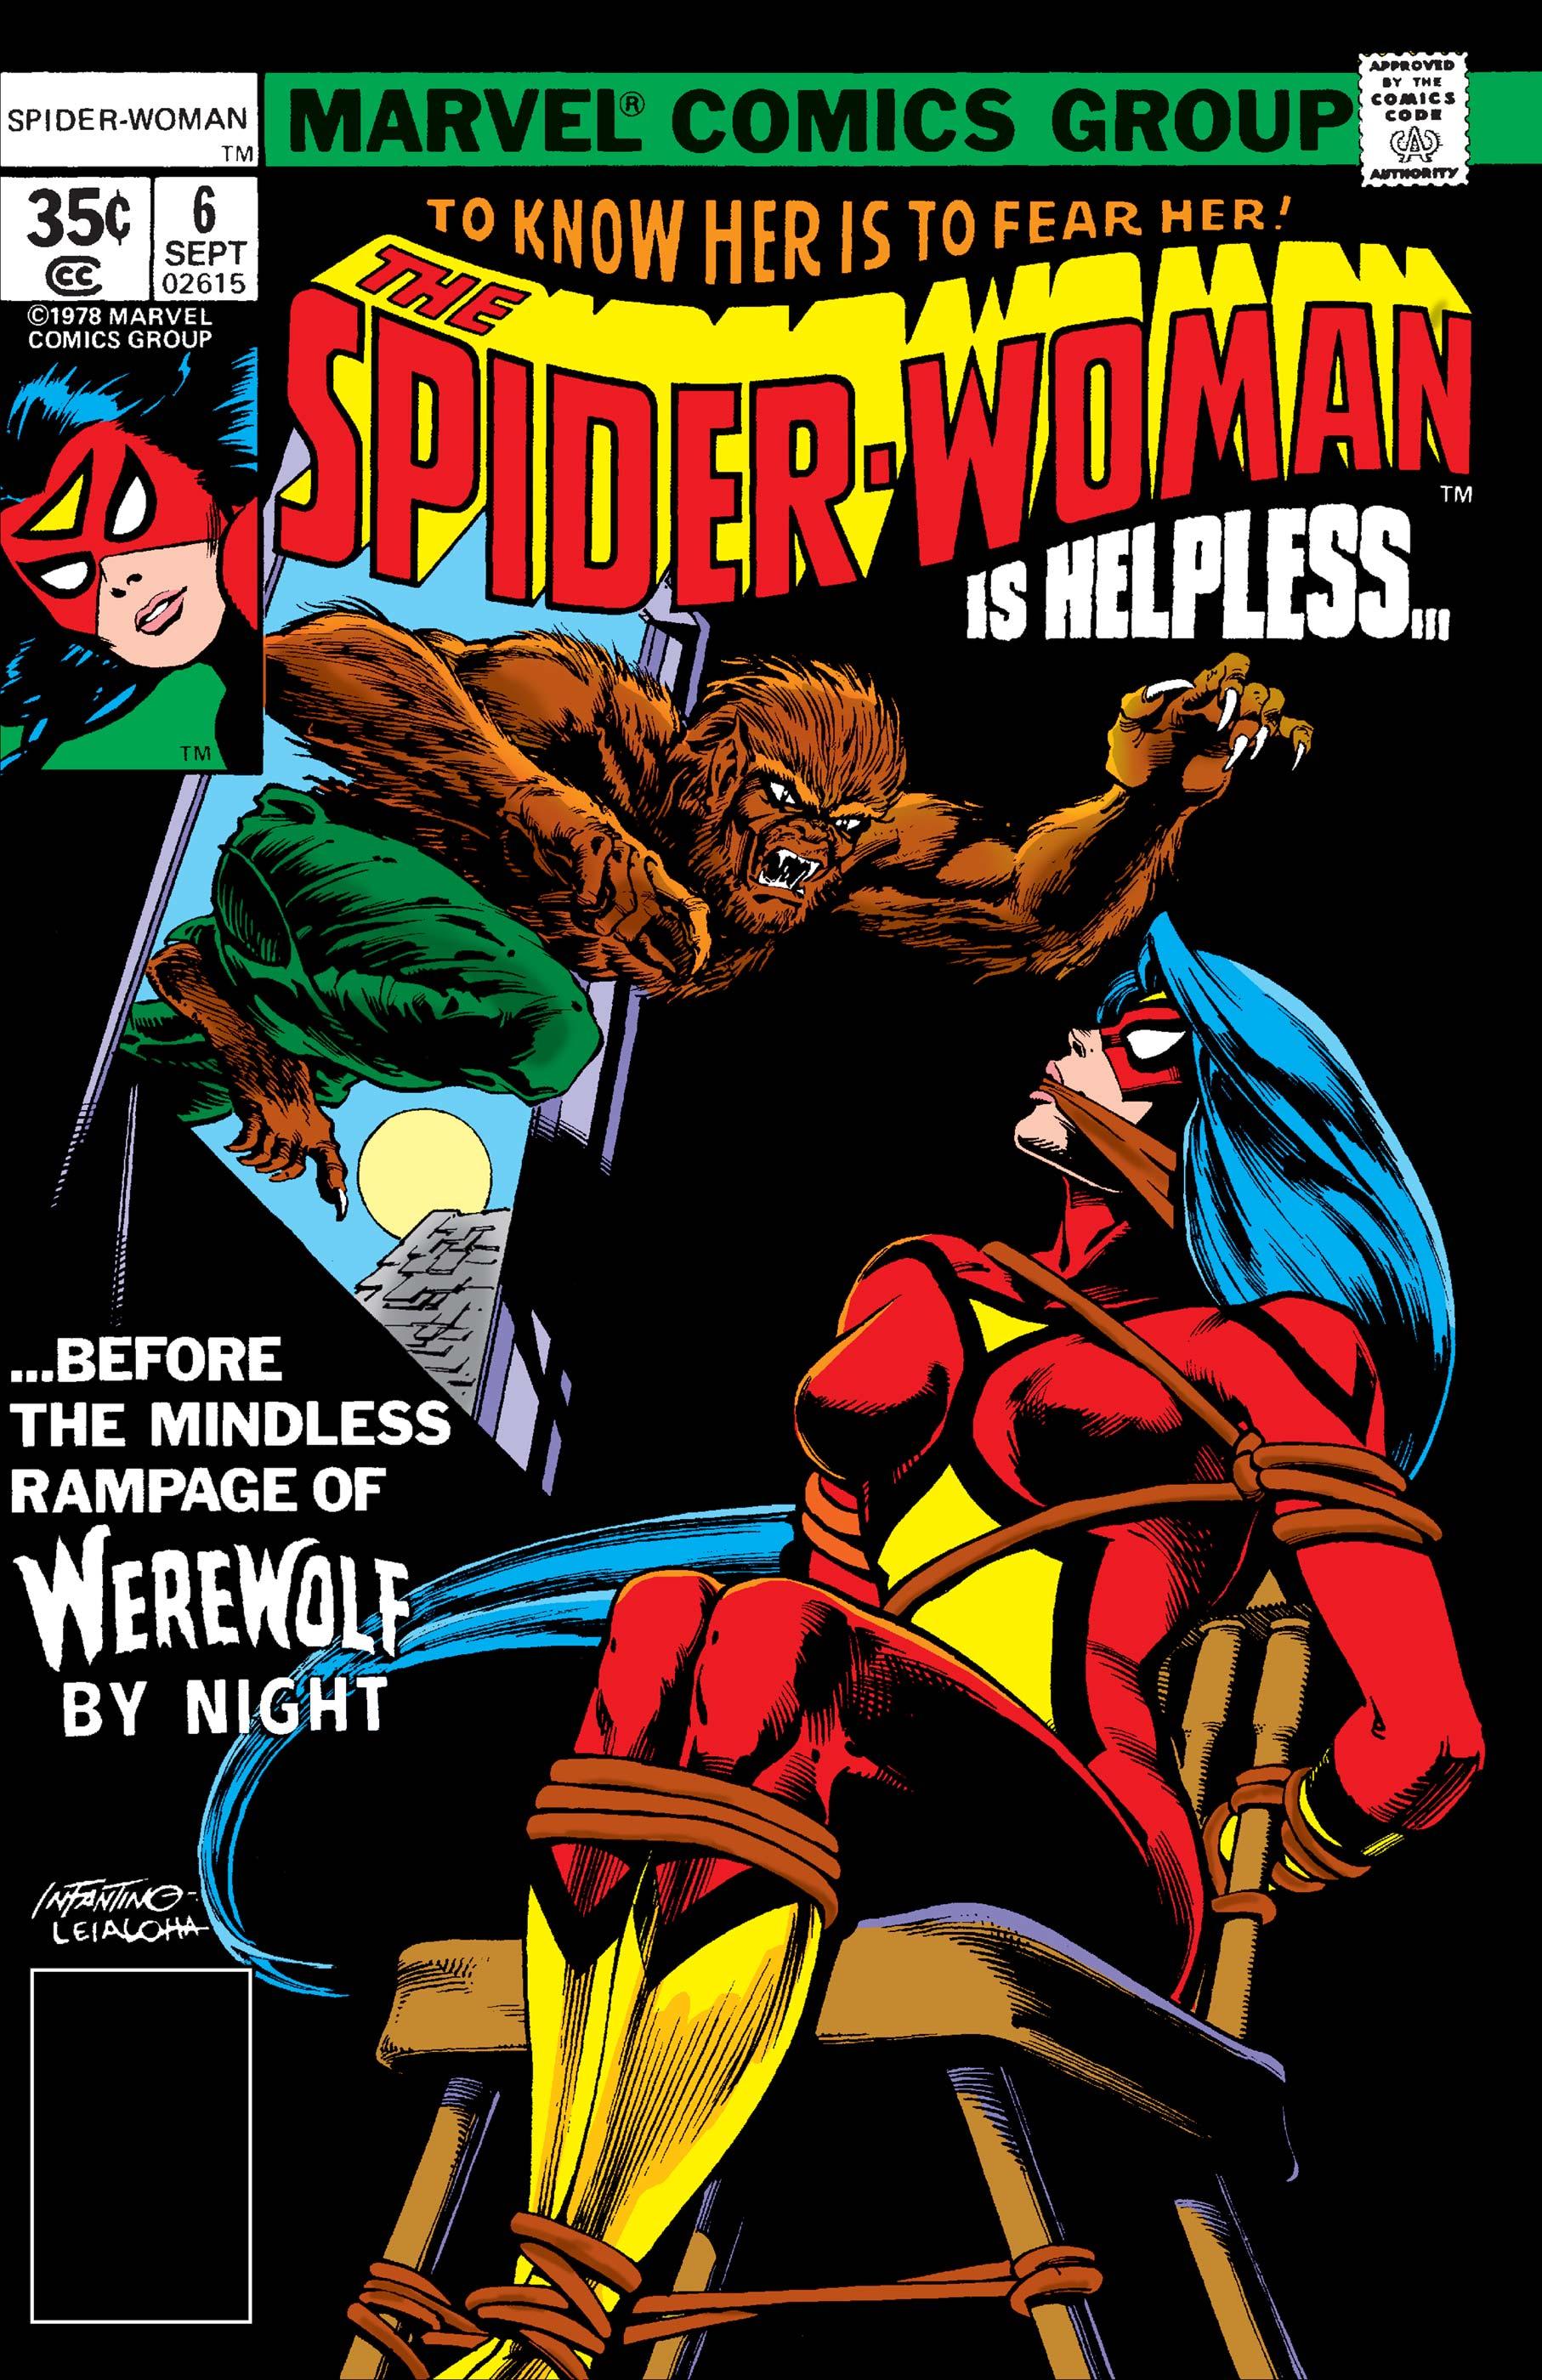 Spider-Woman (1978) #6